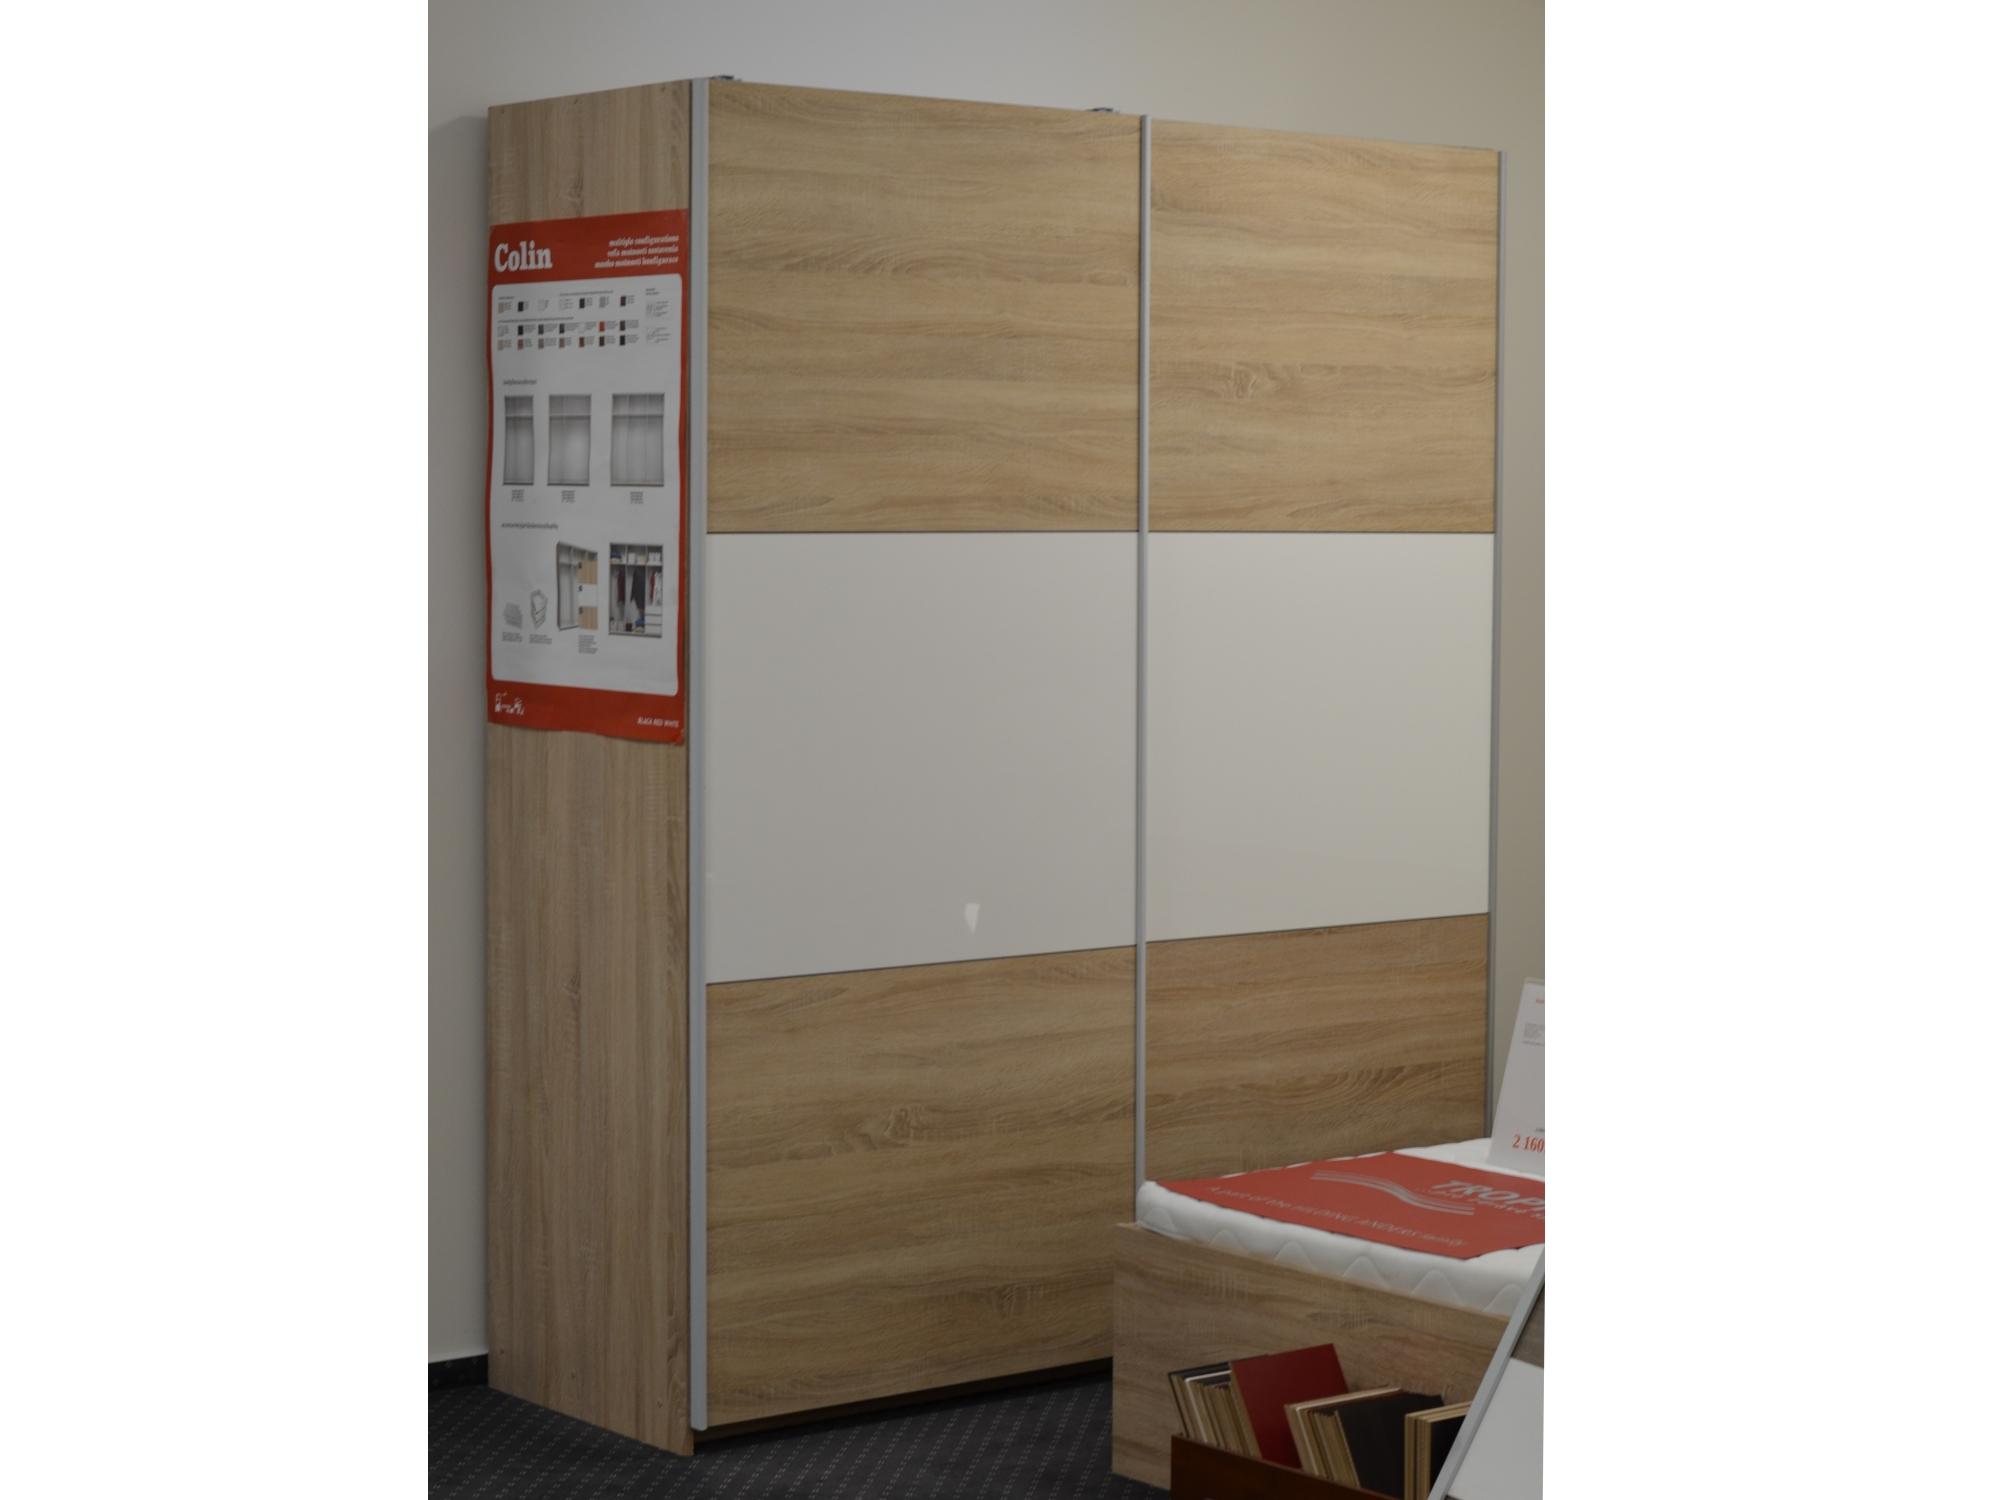 Skříň COLIN 183 cm, dub sonoma + bílý lesk - EXPOZICE